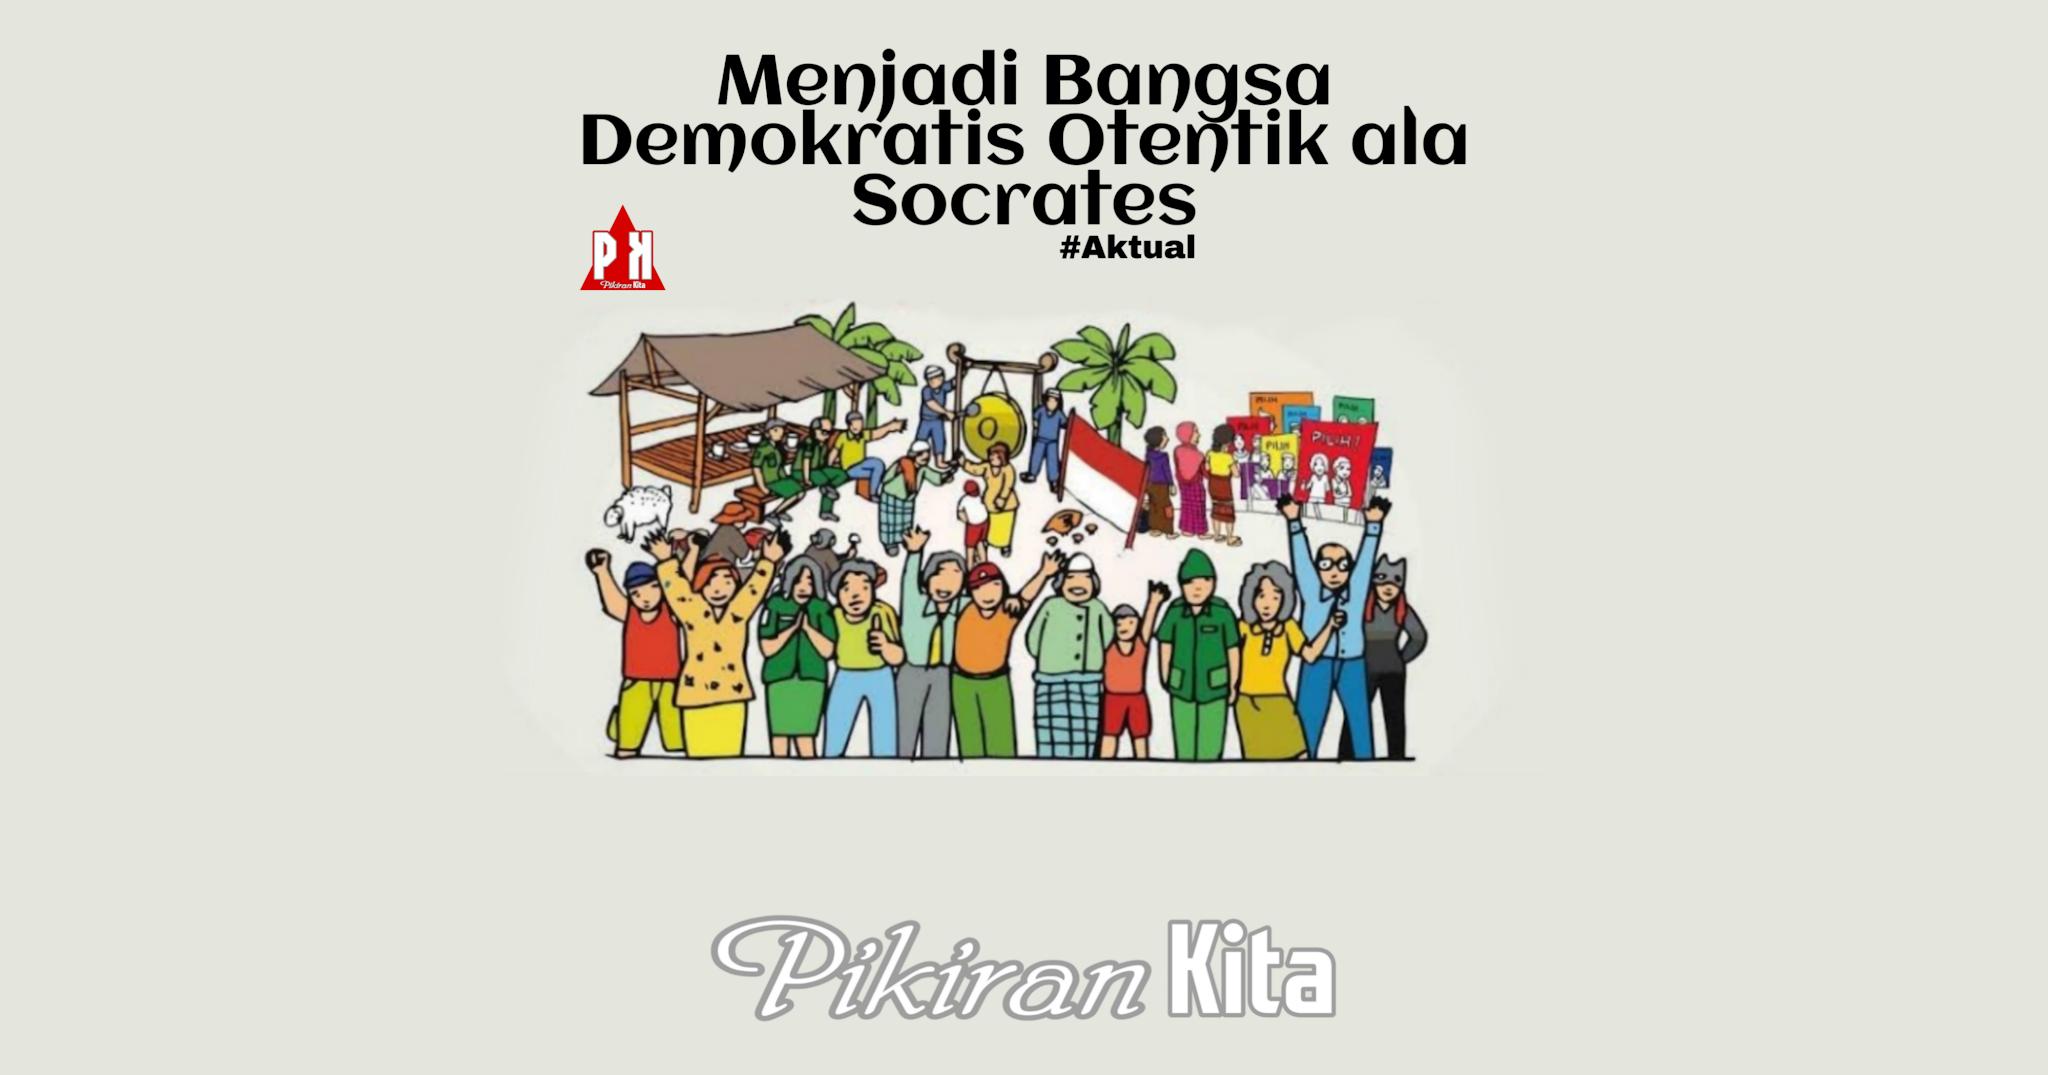 Menjadi Bangsa Demokratis Otentik ala Socrates